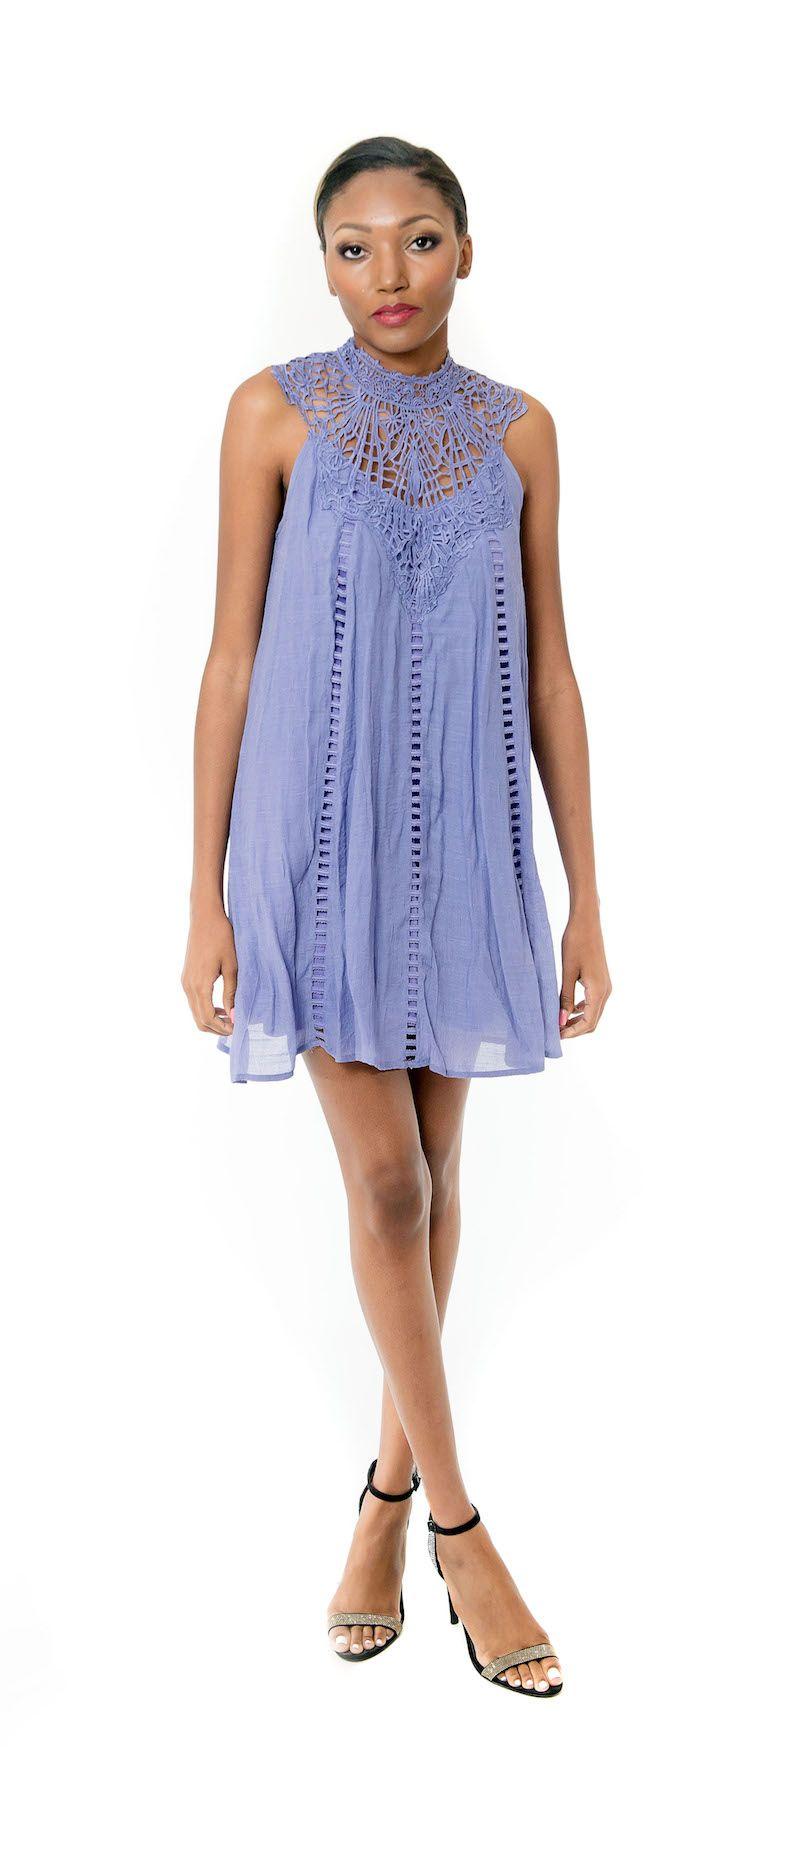 Lavender Dress | Boho Chic Fashion | Pinterest | Blusas